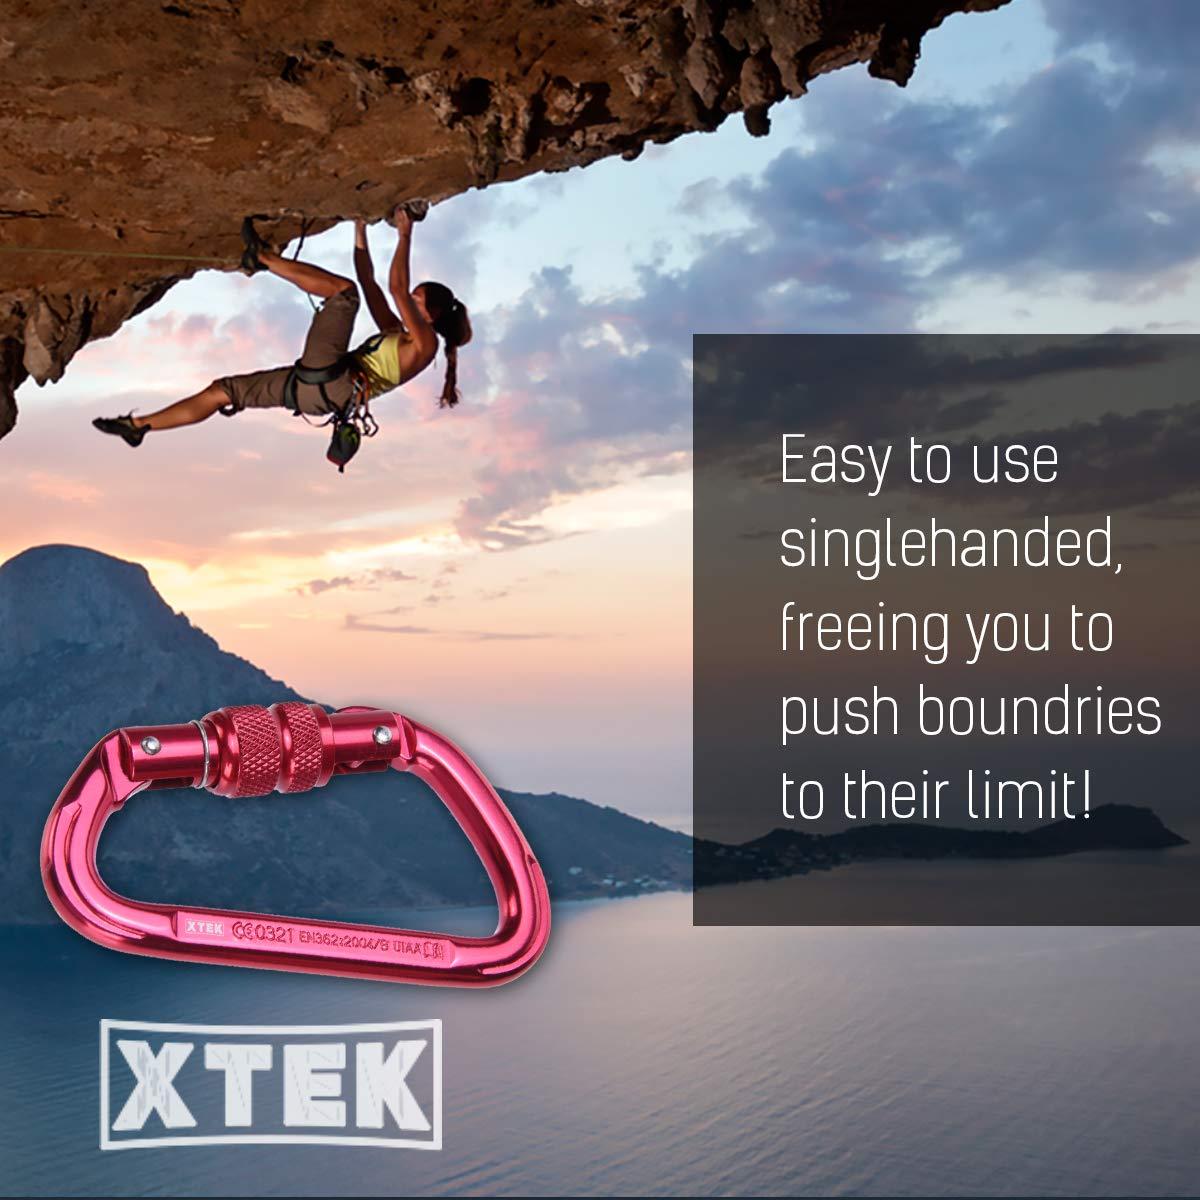 Keys Rock Climbing Carabiner Dog Leashes Light Weight Heavy Duty Carabiner Climbing 4 23kN // 5171lb Aluminum Locking Carabiner Clip for Tree Climbing UIAA /& CE Rated